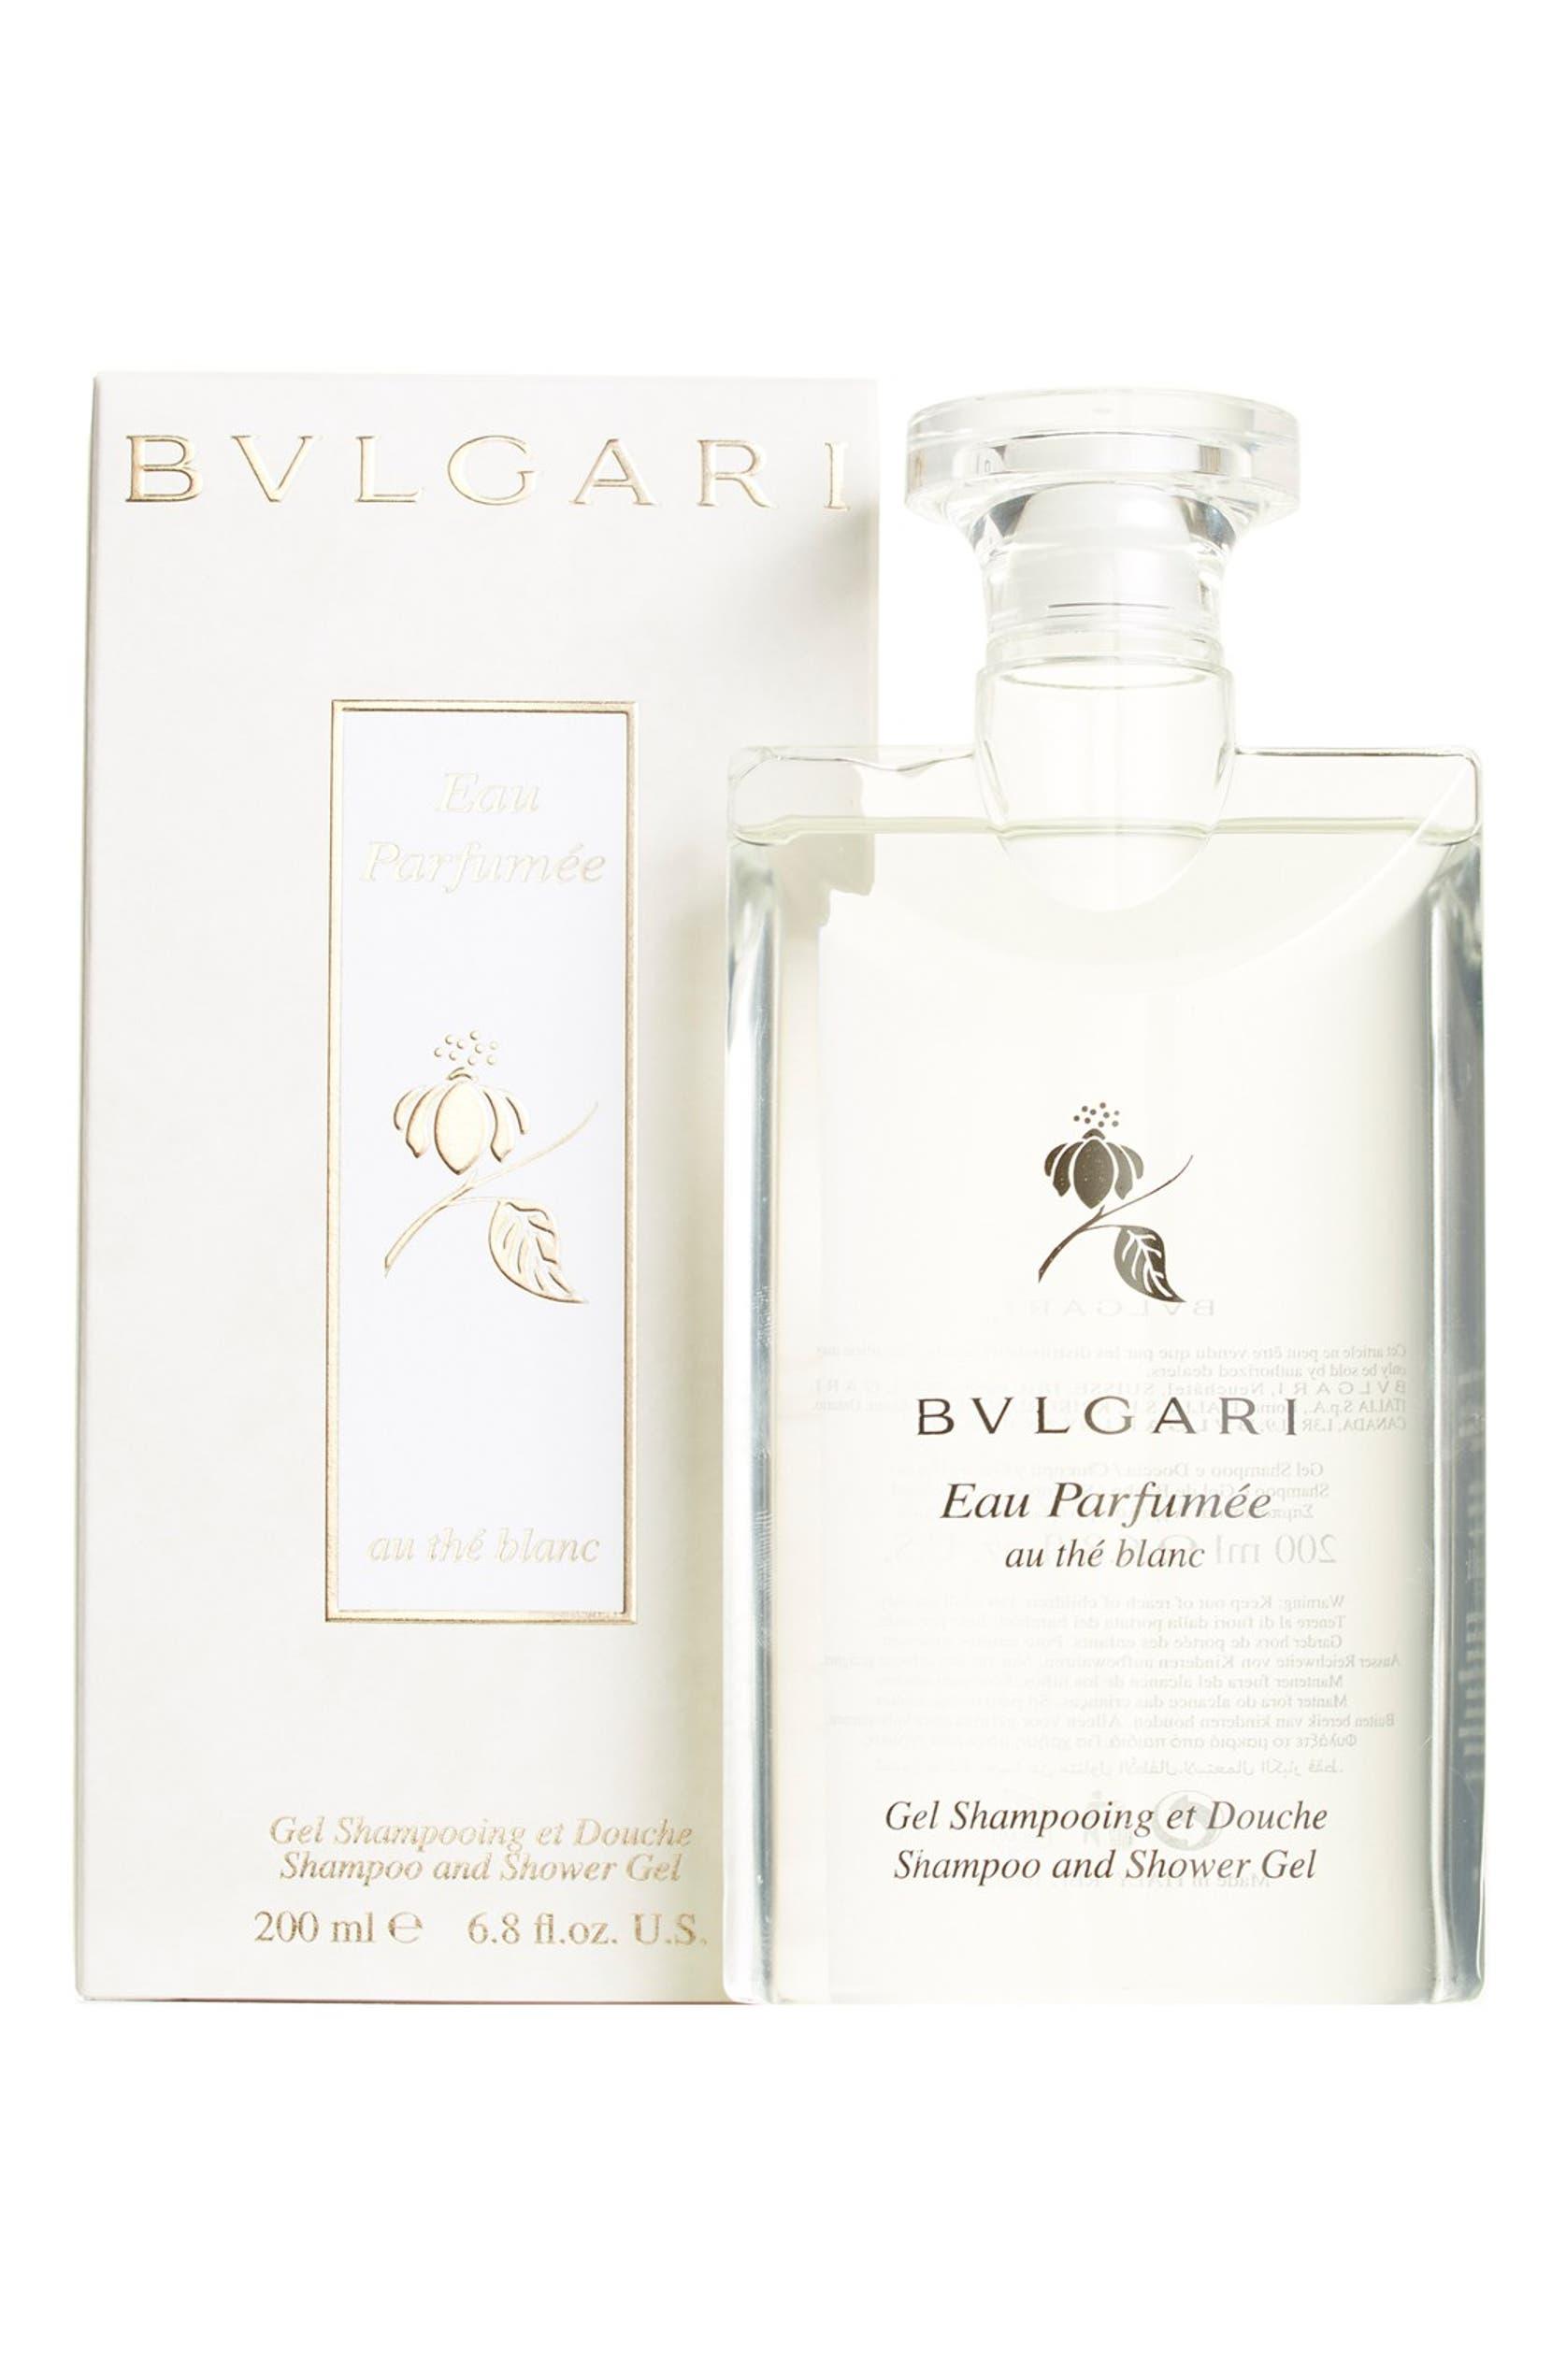 BVLGARI  Eau Parfumée au thé blanc  Shampoo   Shower Gel   Nordstrom 3ec15d0f2c5